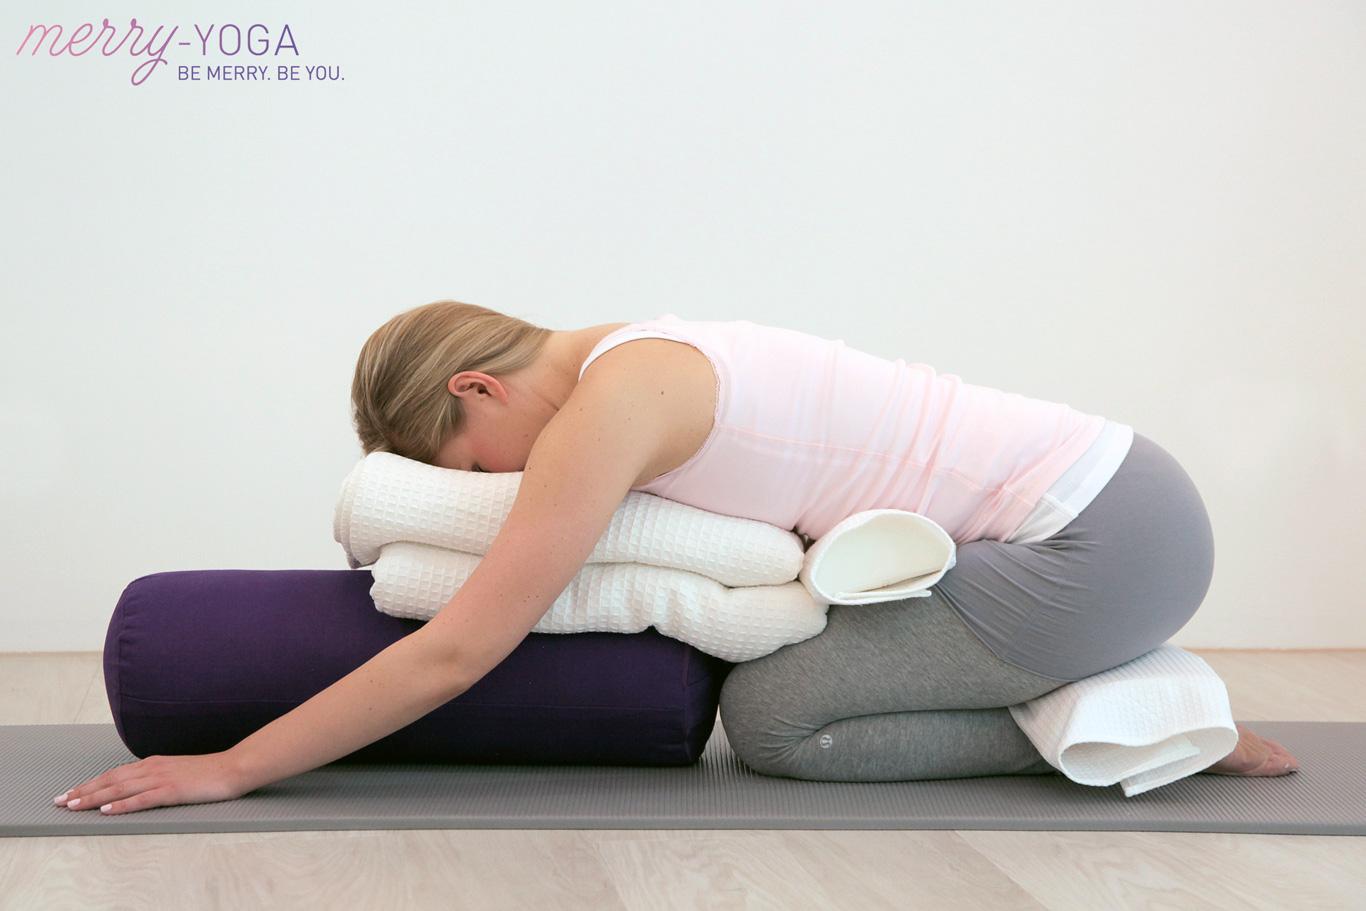 Merry-Yoga | München